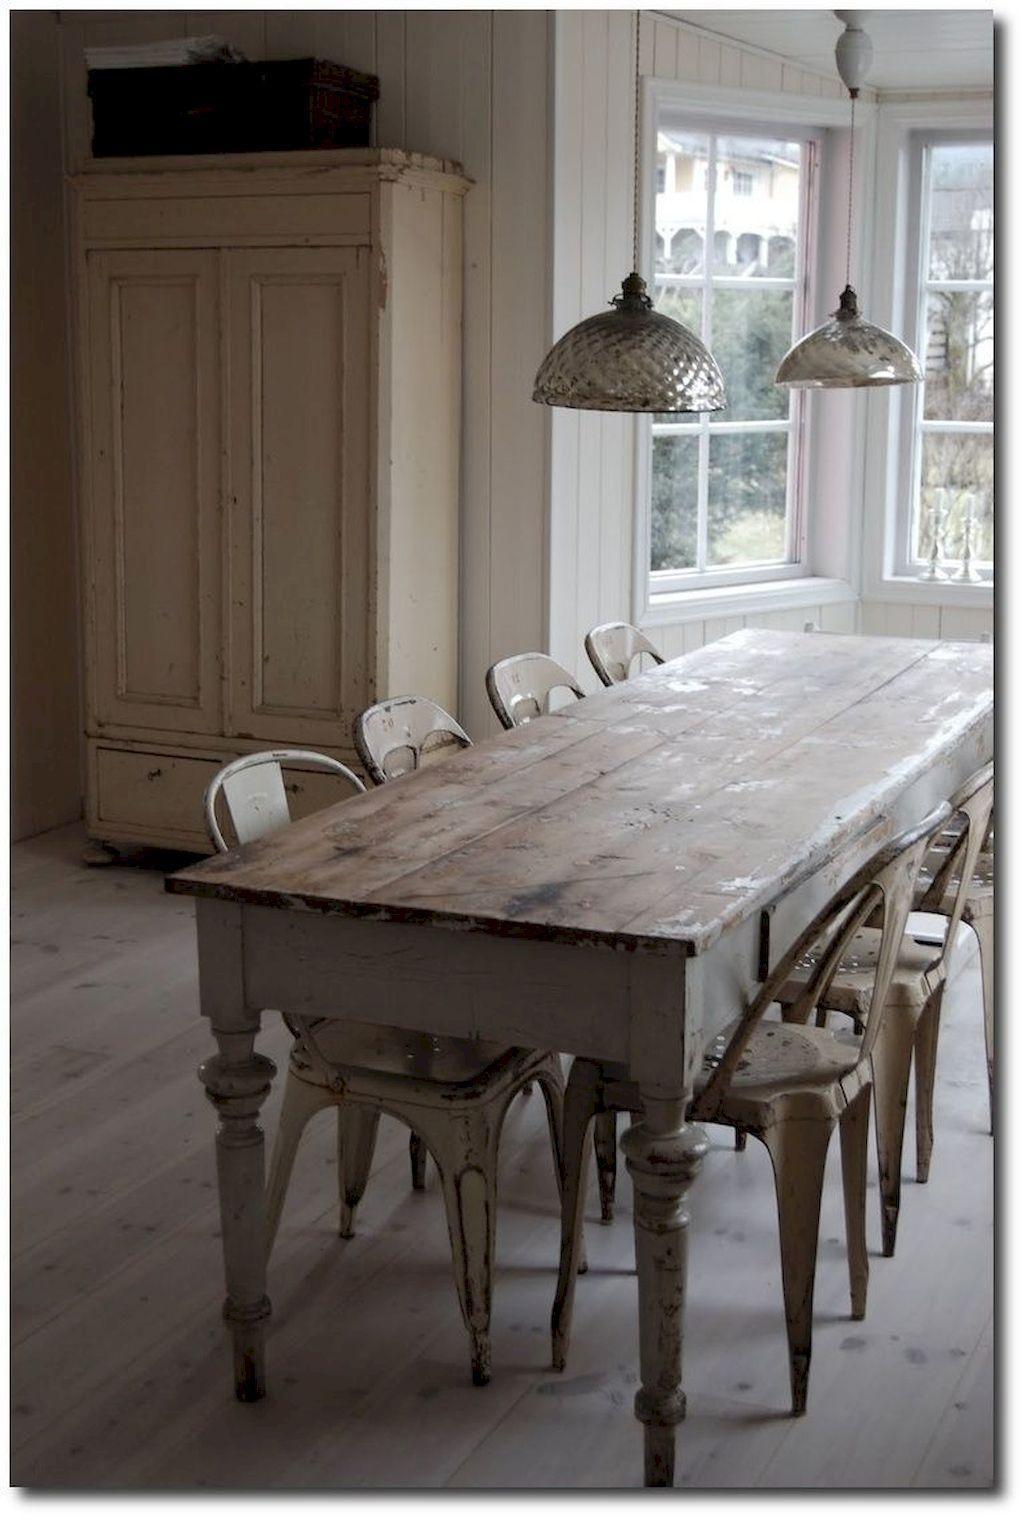 Cool 30+ Creative Farmhouse Table Design Ideas With Rustic